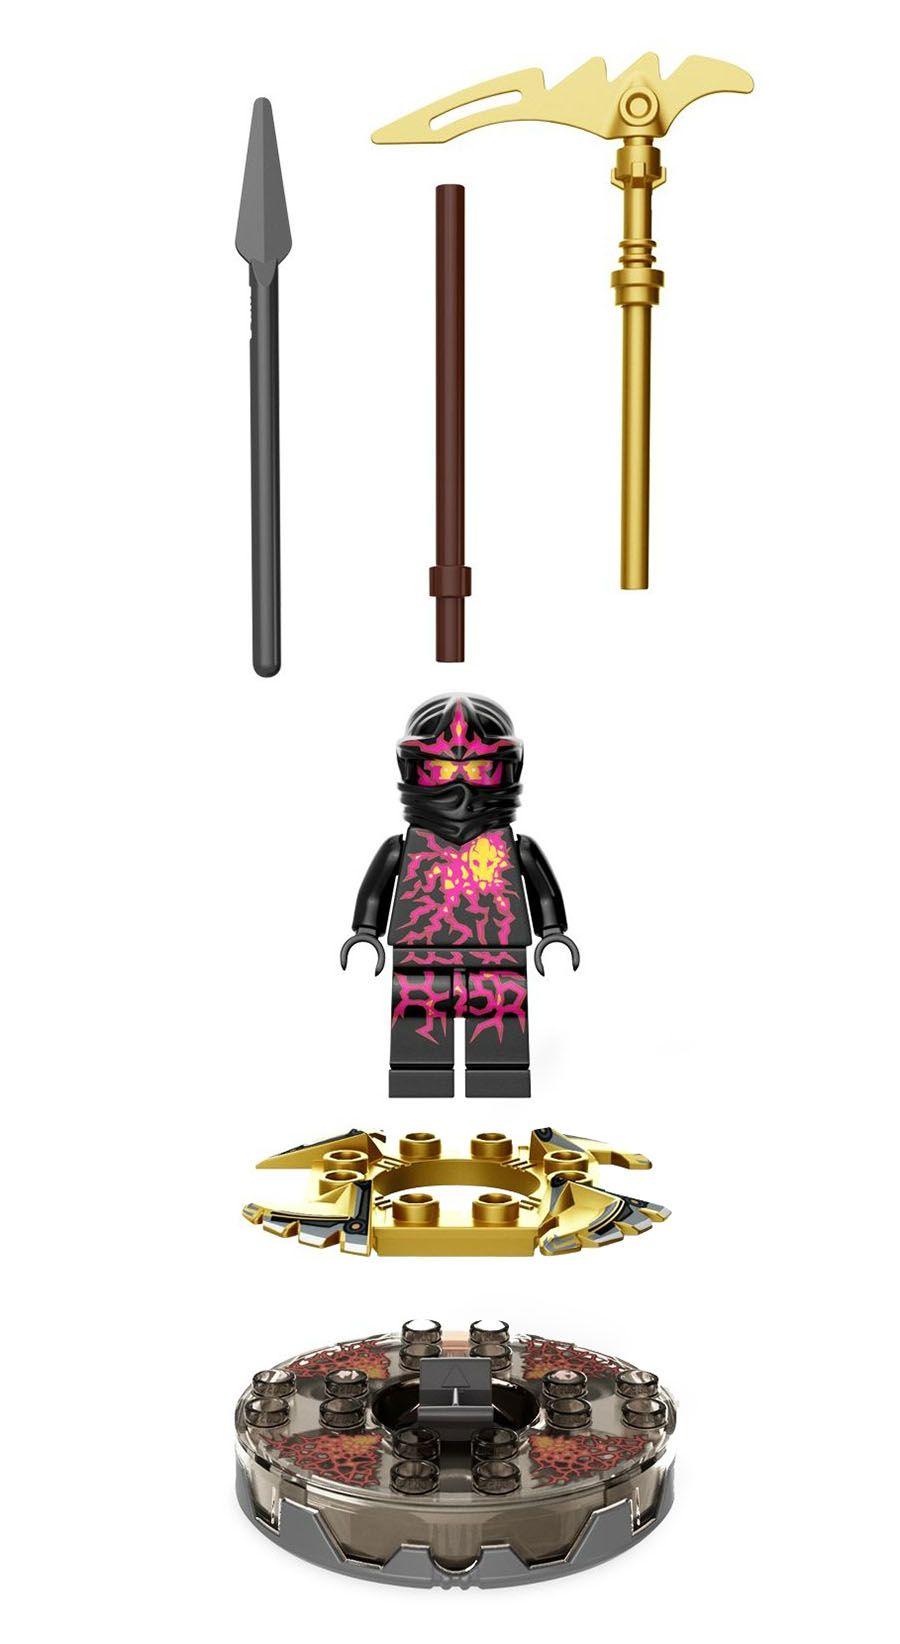 lego ninjago 9572 pas cher nrg cole